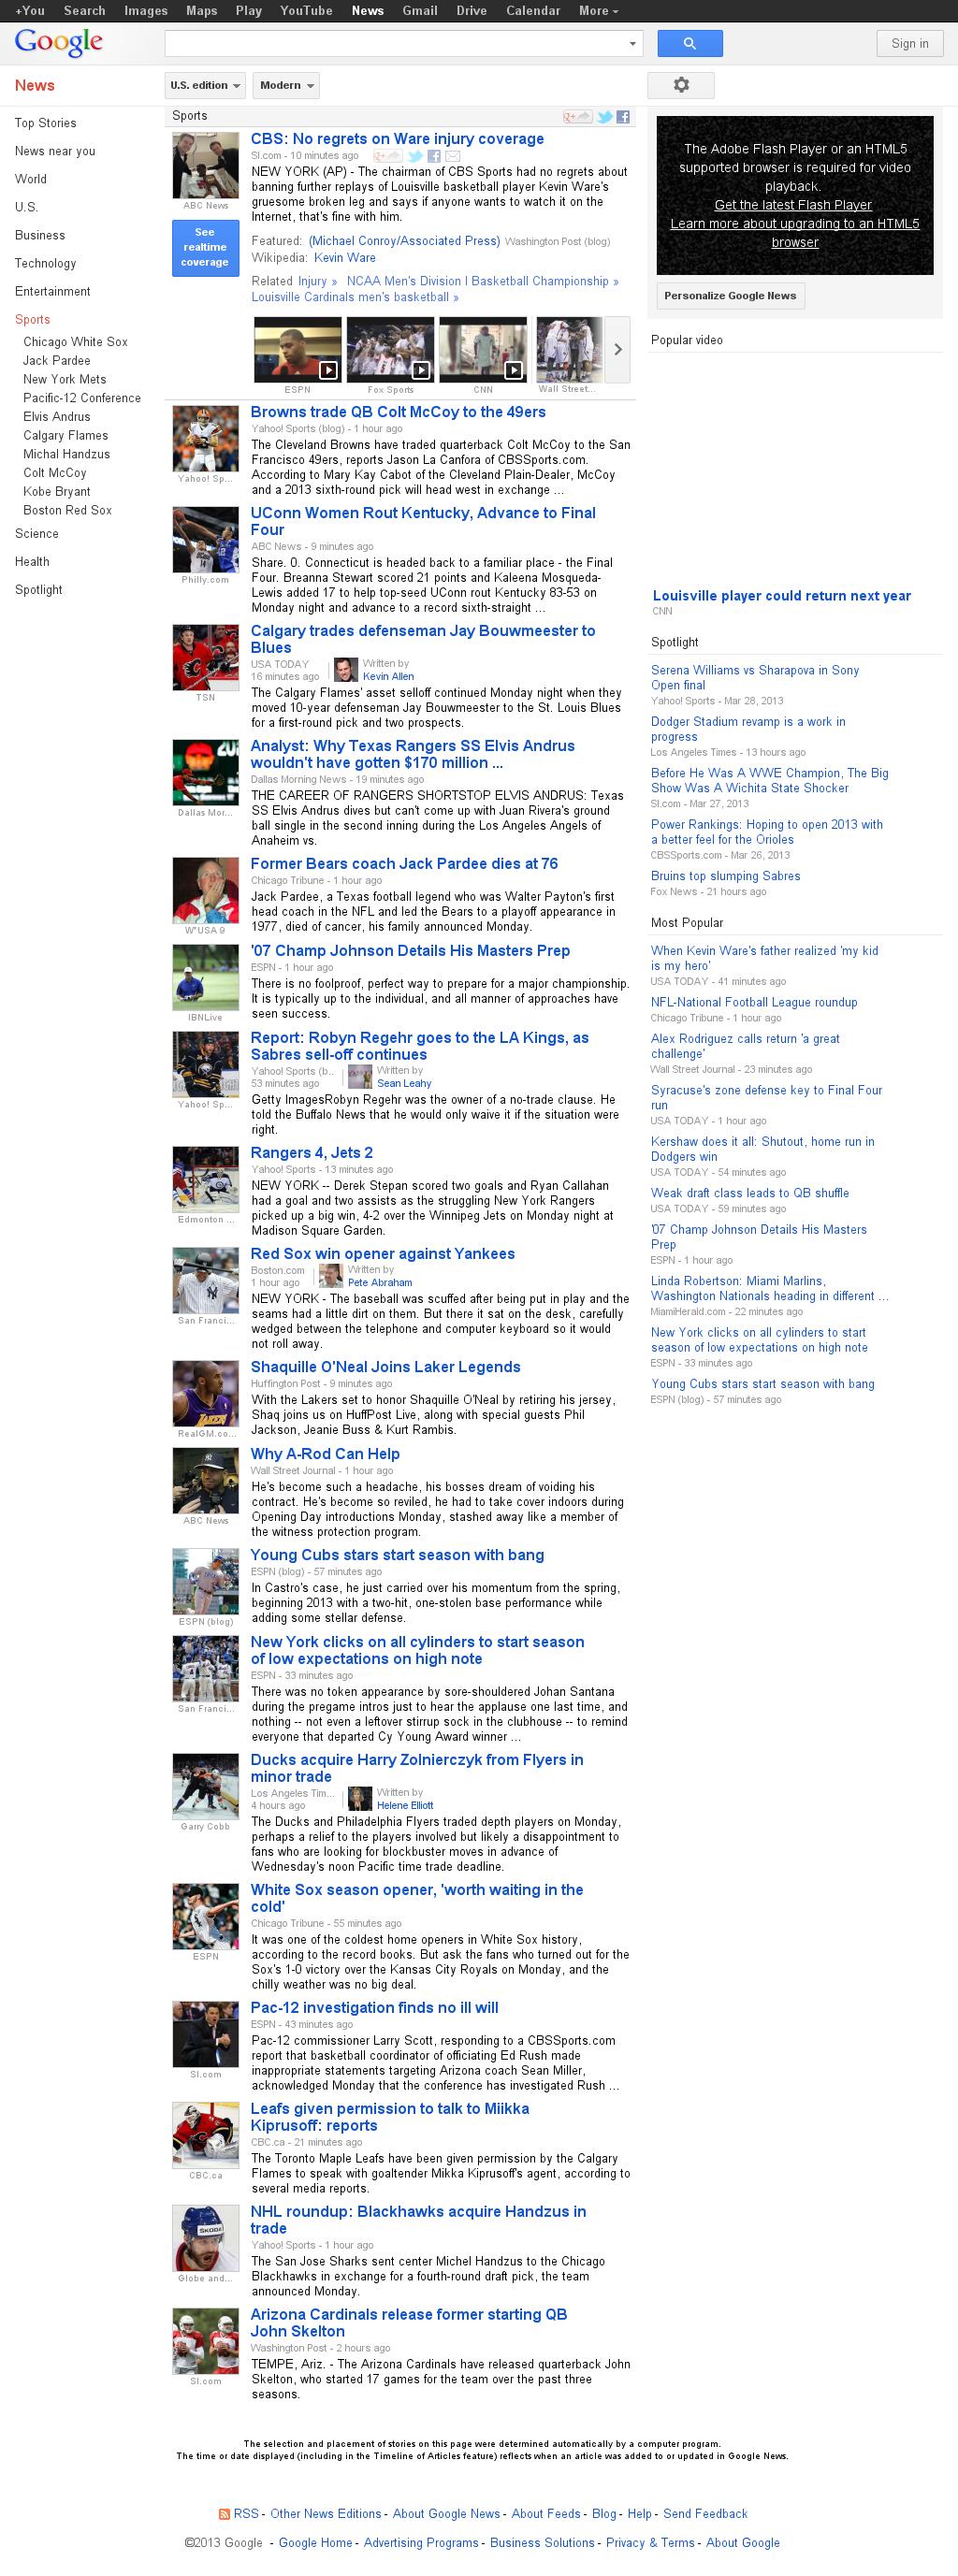 Google News: Sports at Tuesday April 2, 2013, 2:08 a.m. UTC